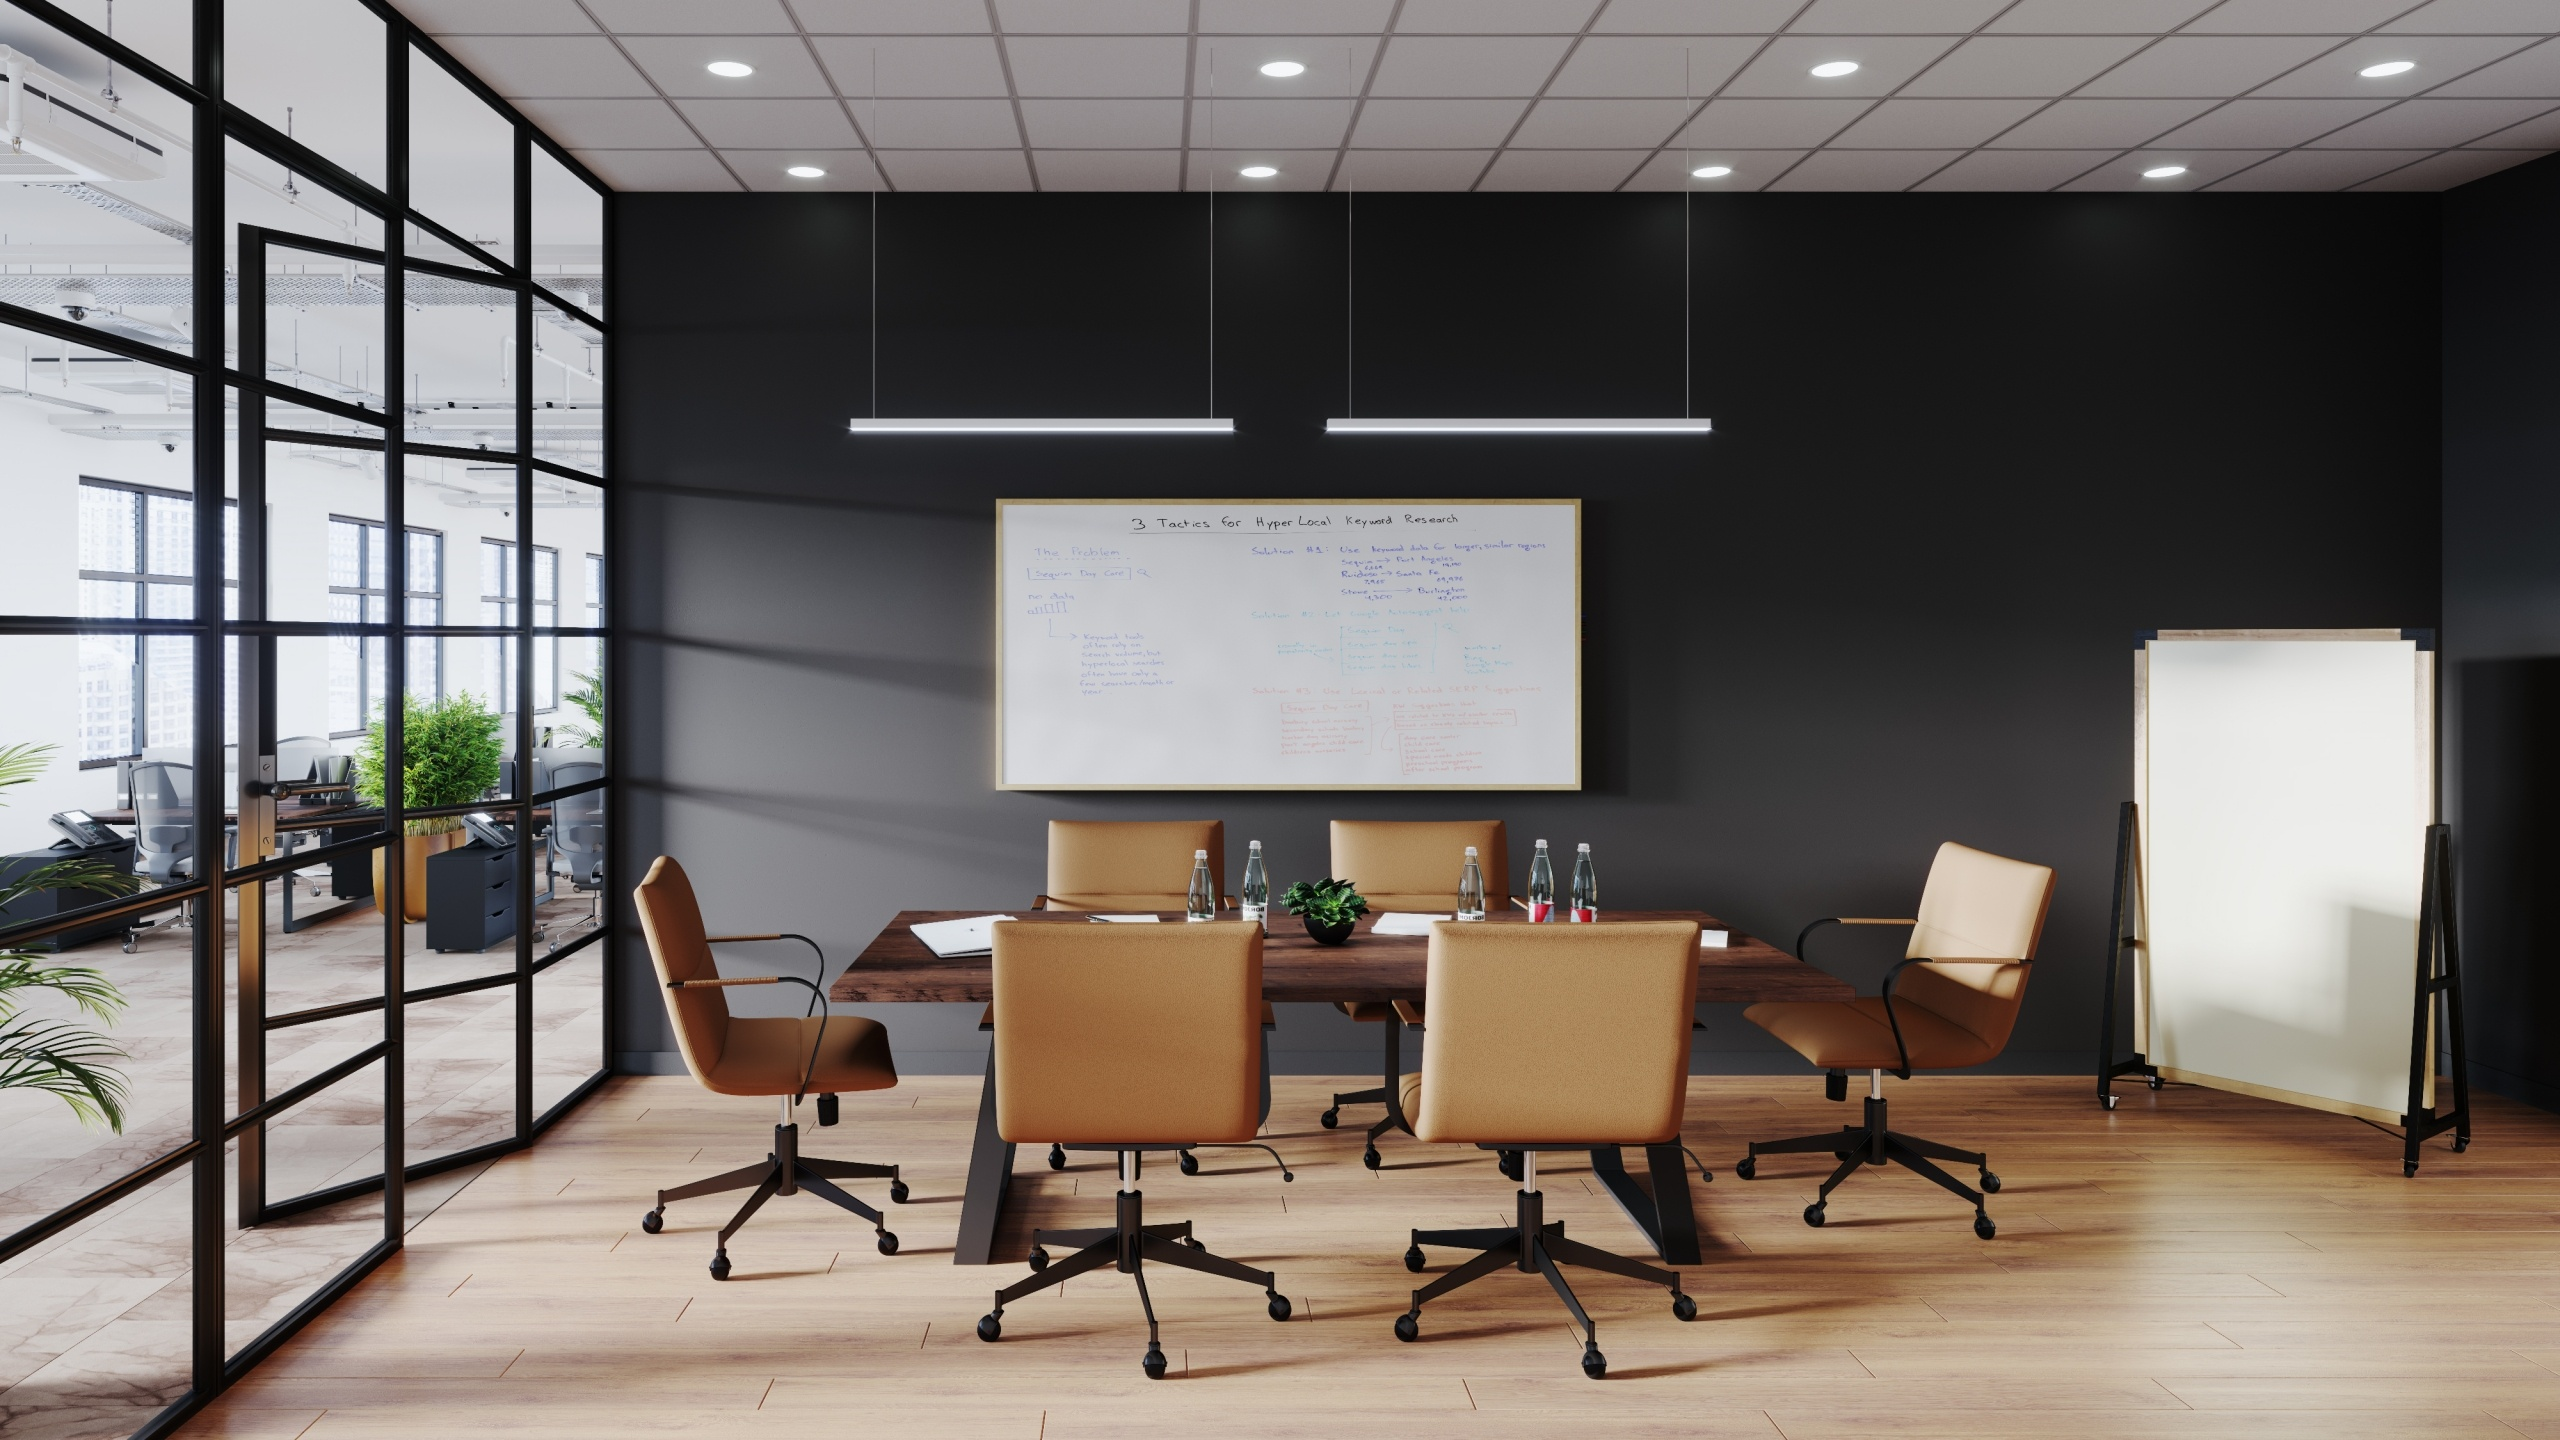 Conference Room Furniture 3D Rendering